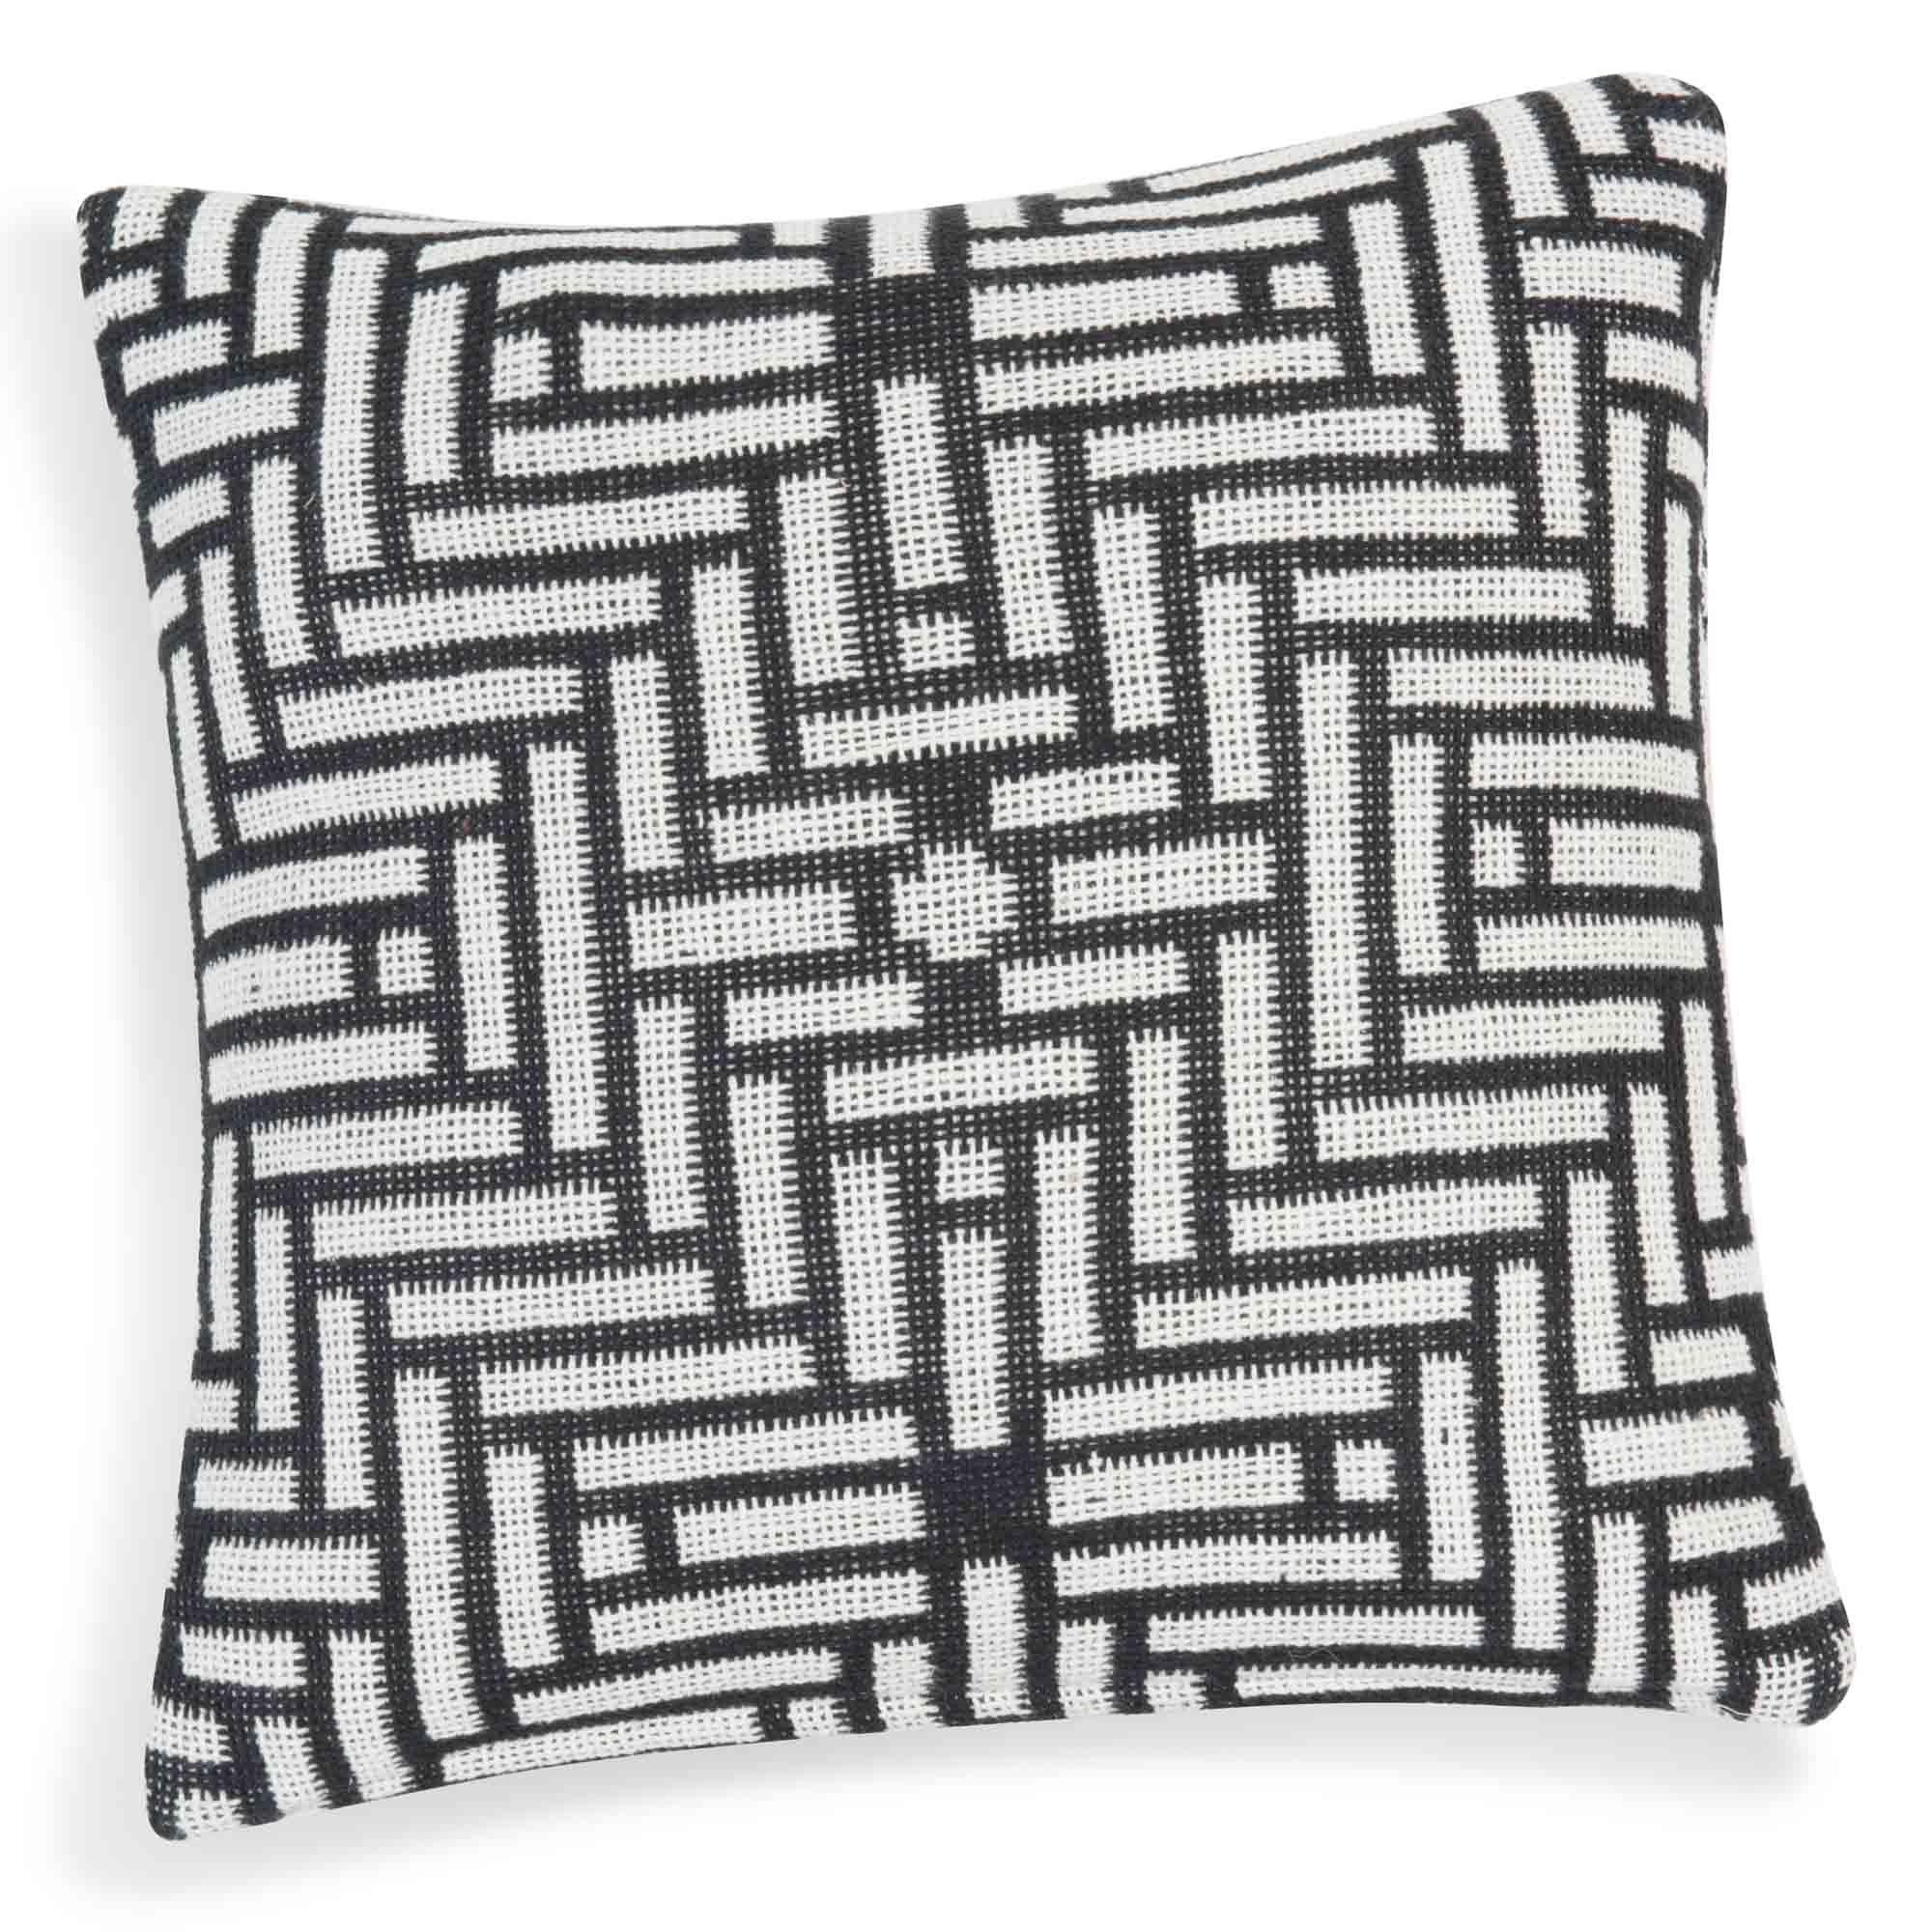 Housse De Coussin En Coton Noire Blanche 40 X 40 Cm Evora Cushion Cover Sofa Decor Throw Pillows